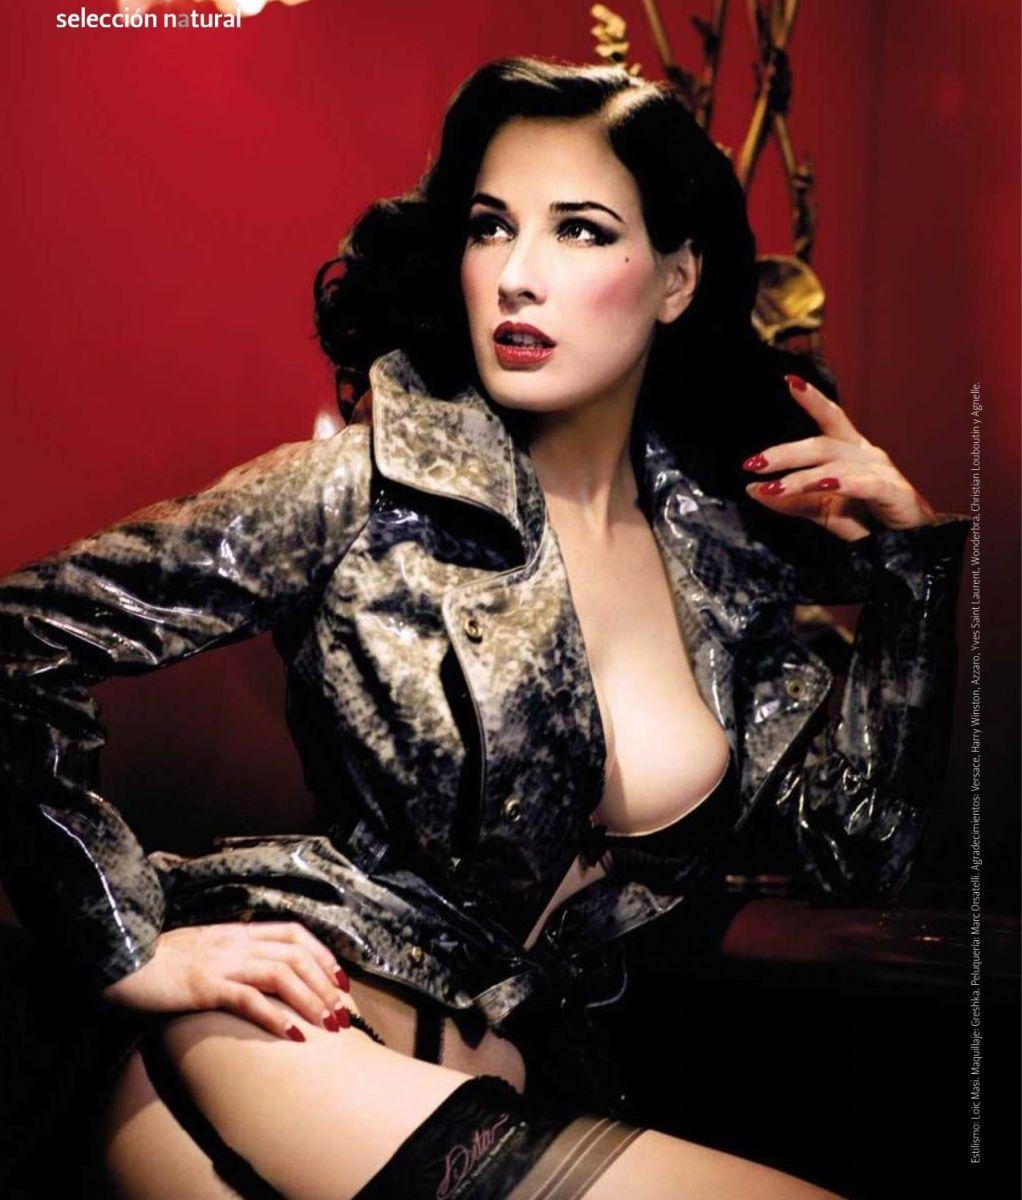 Dita Von Teese - Burlesque Queen and Ultimate Femme Fatale